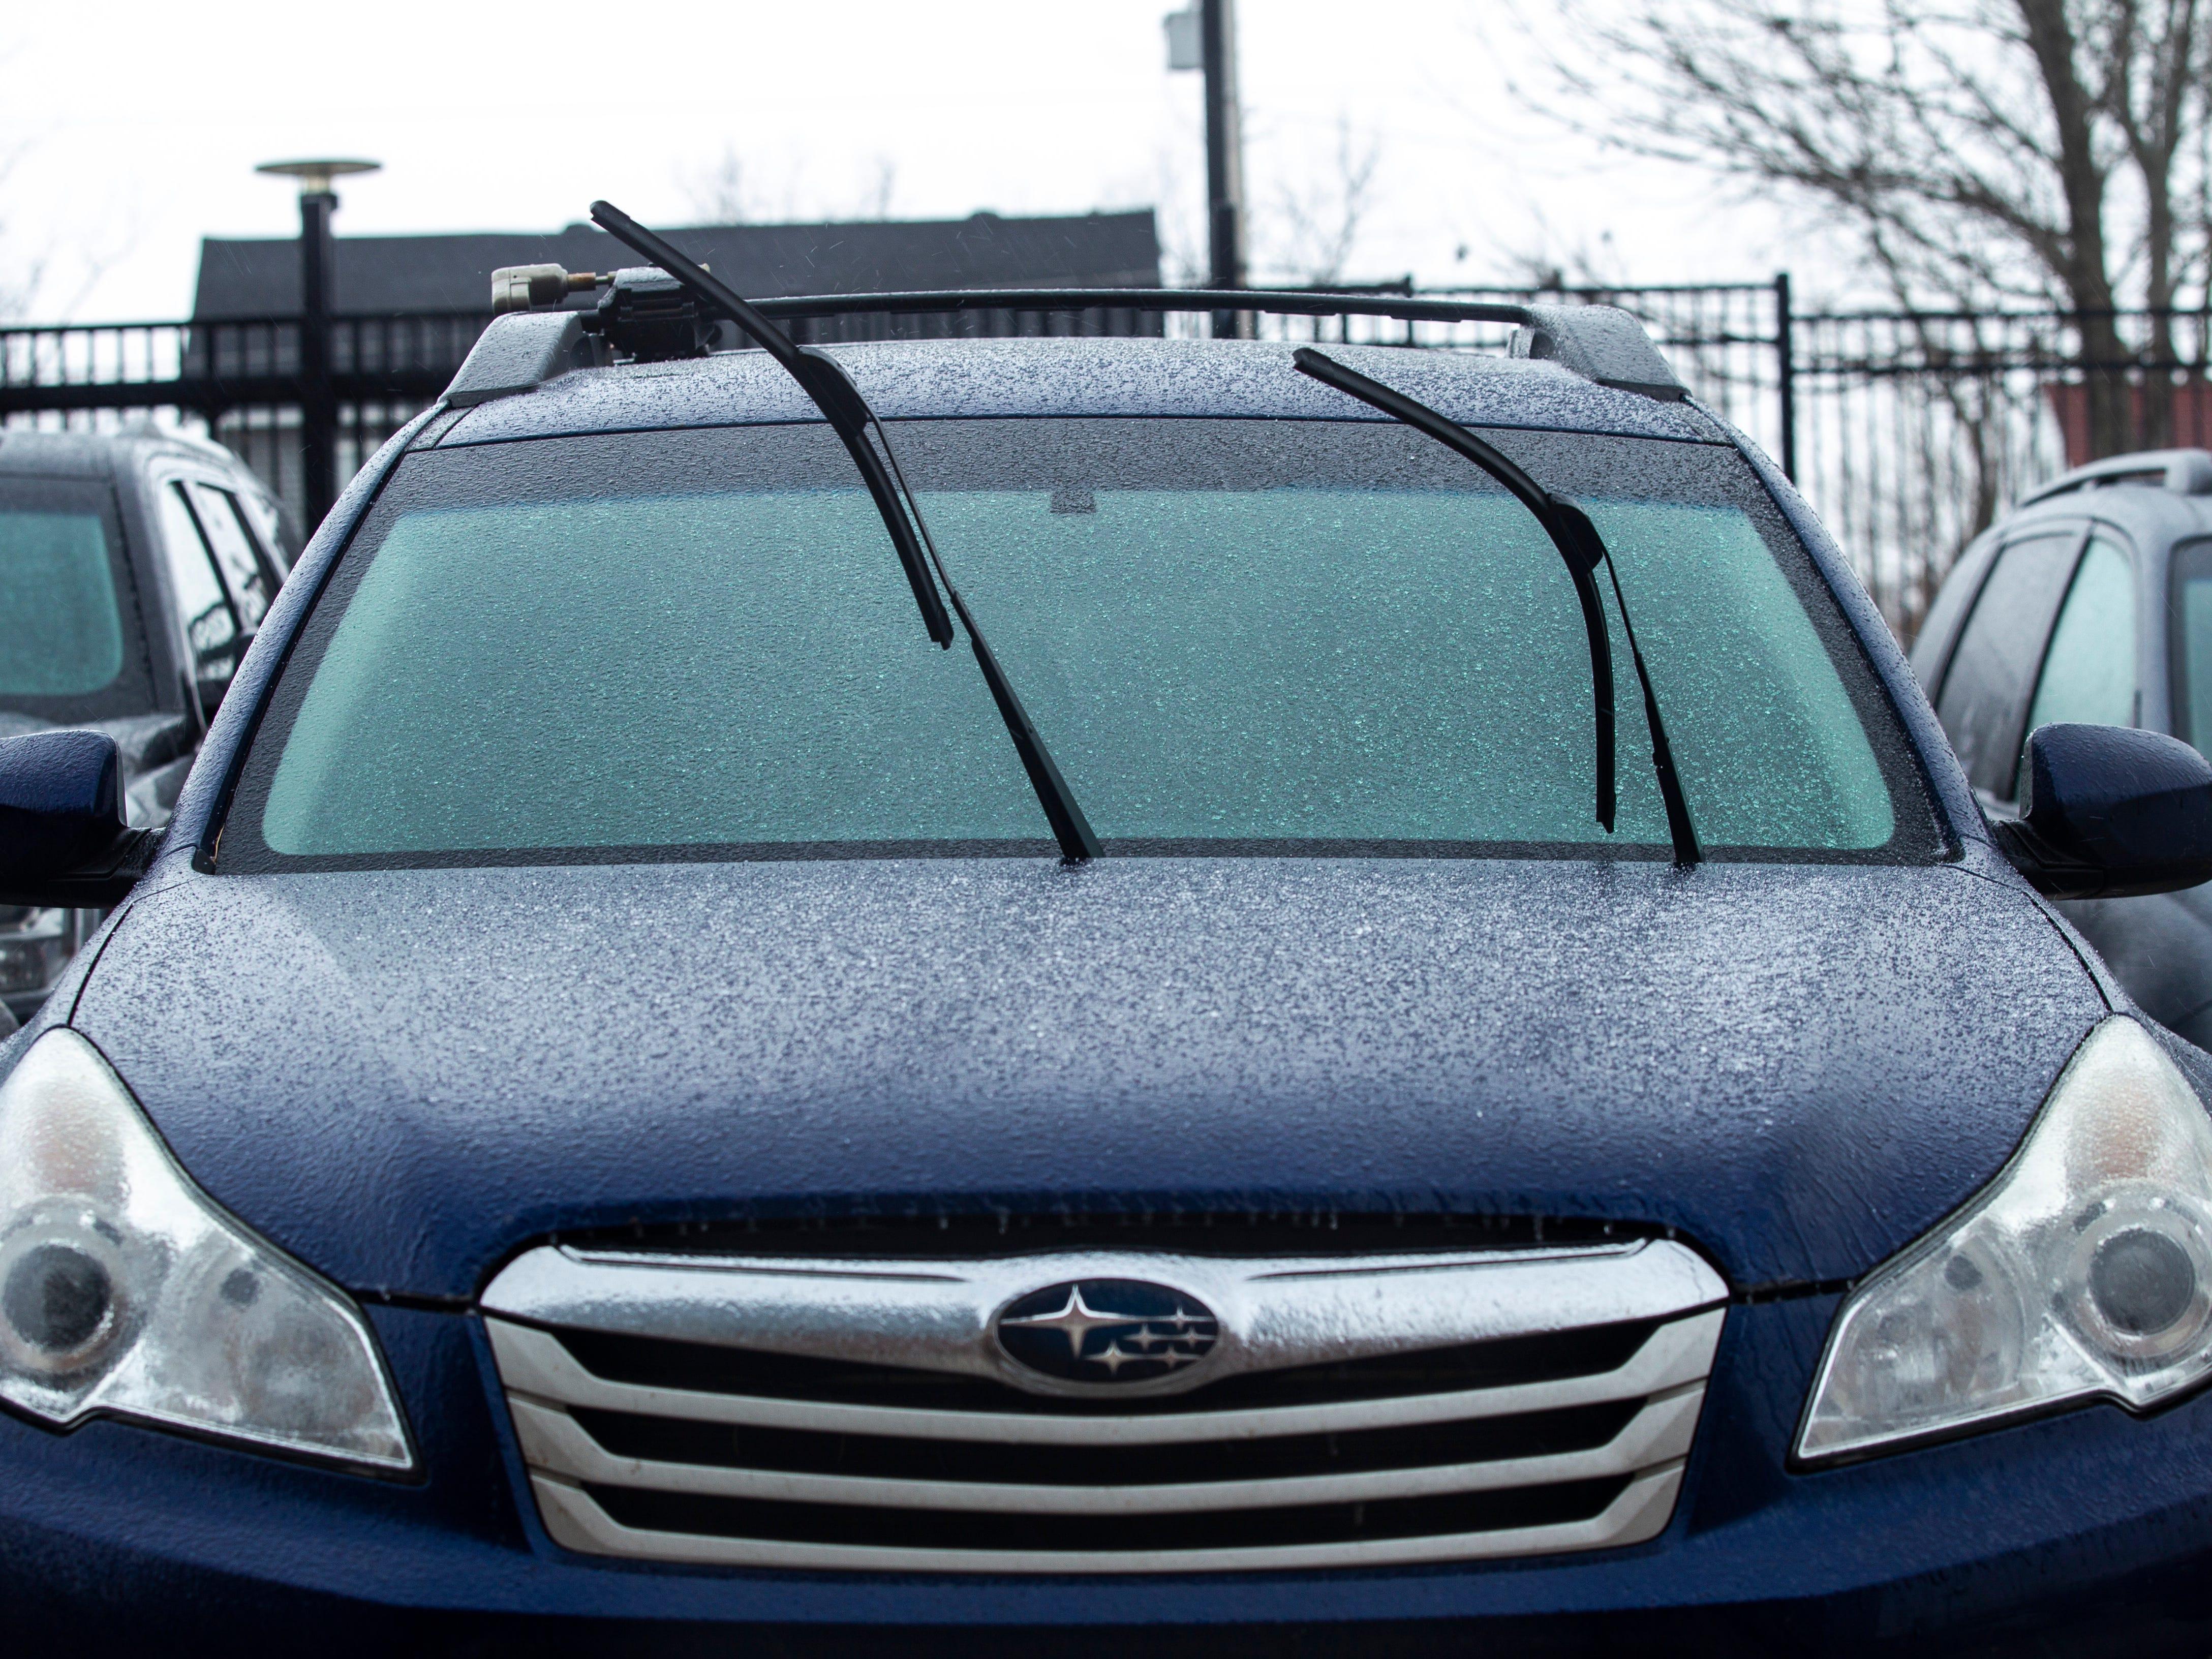 Freezing rain falls on Tuesday, Feb. 5, 2019, in Iowa City, Iowa.